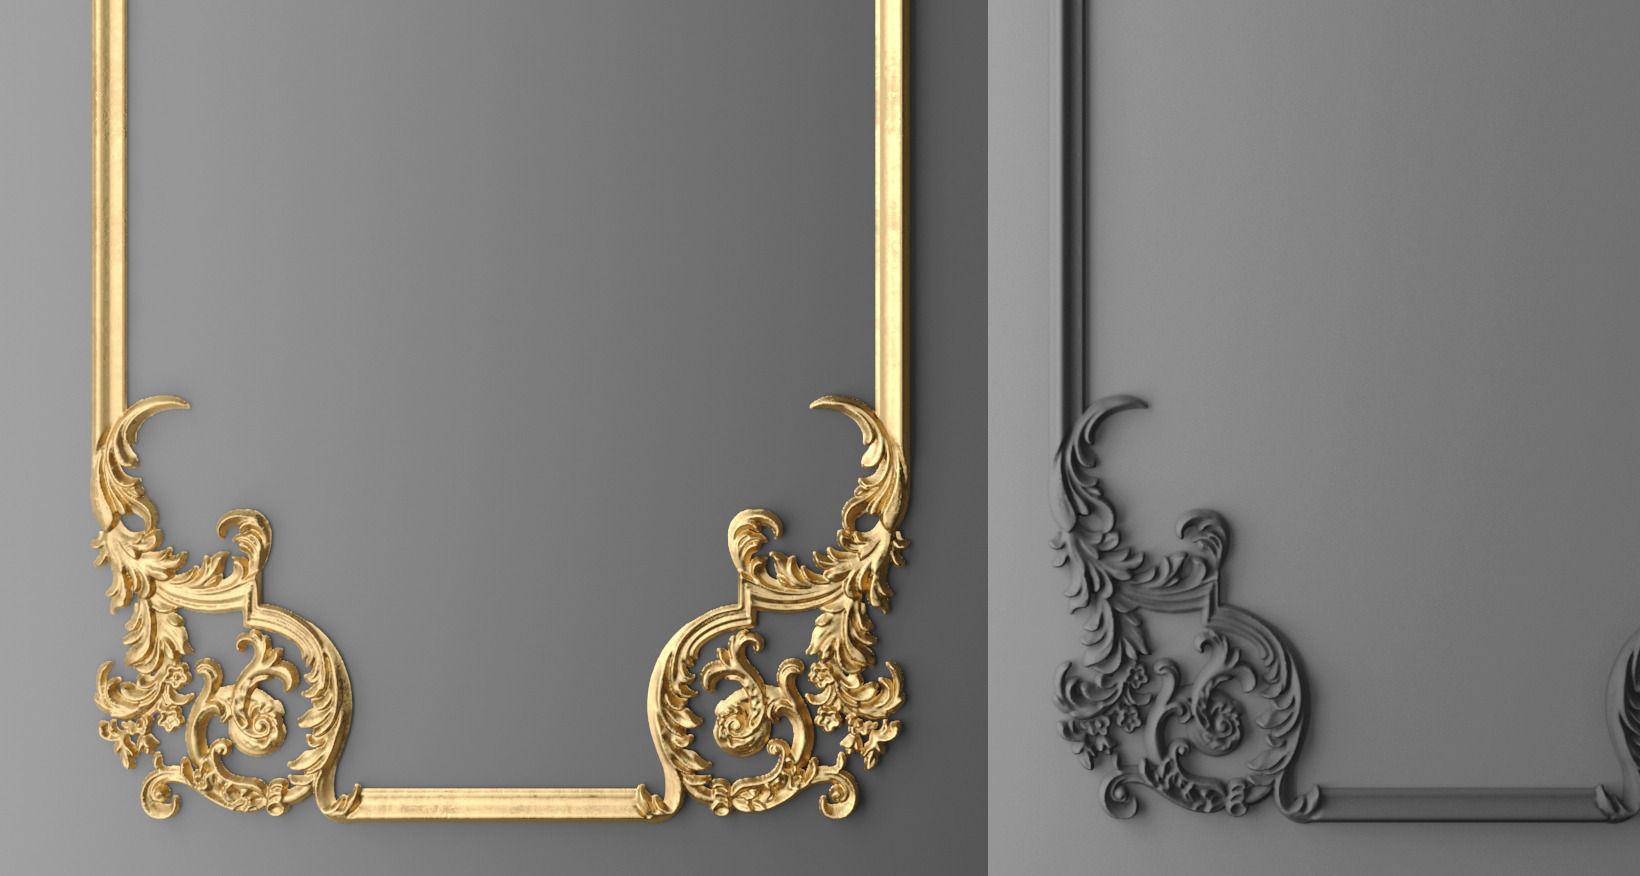 frame molding 1 3d model max obj fbx mtl 4